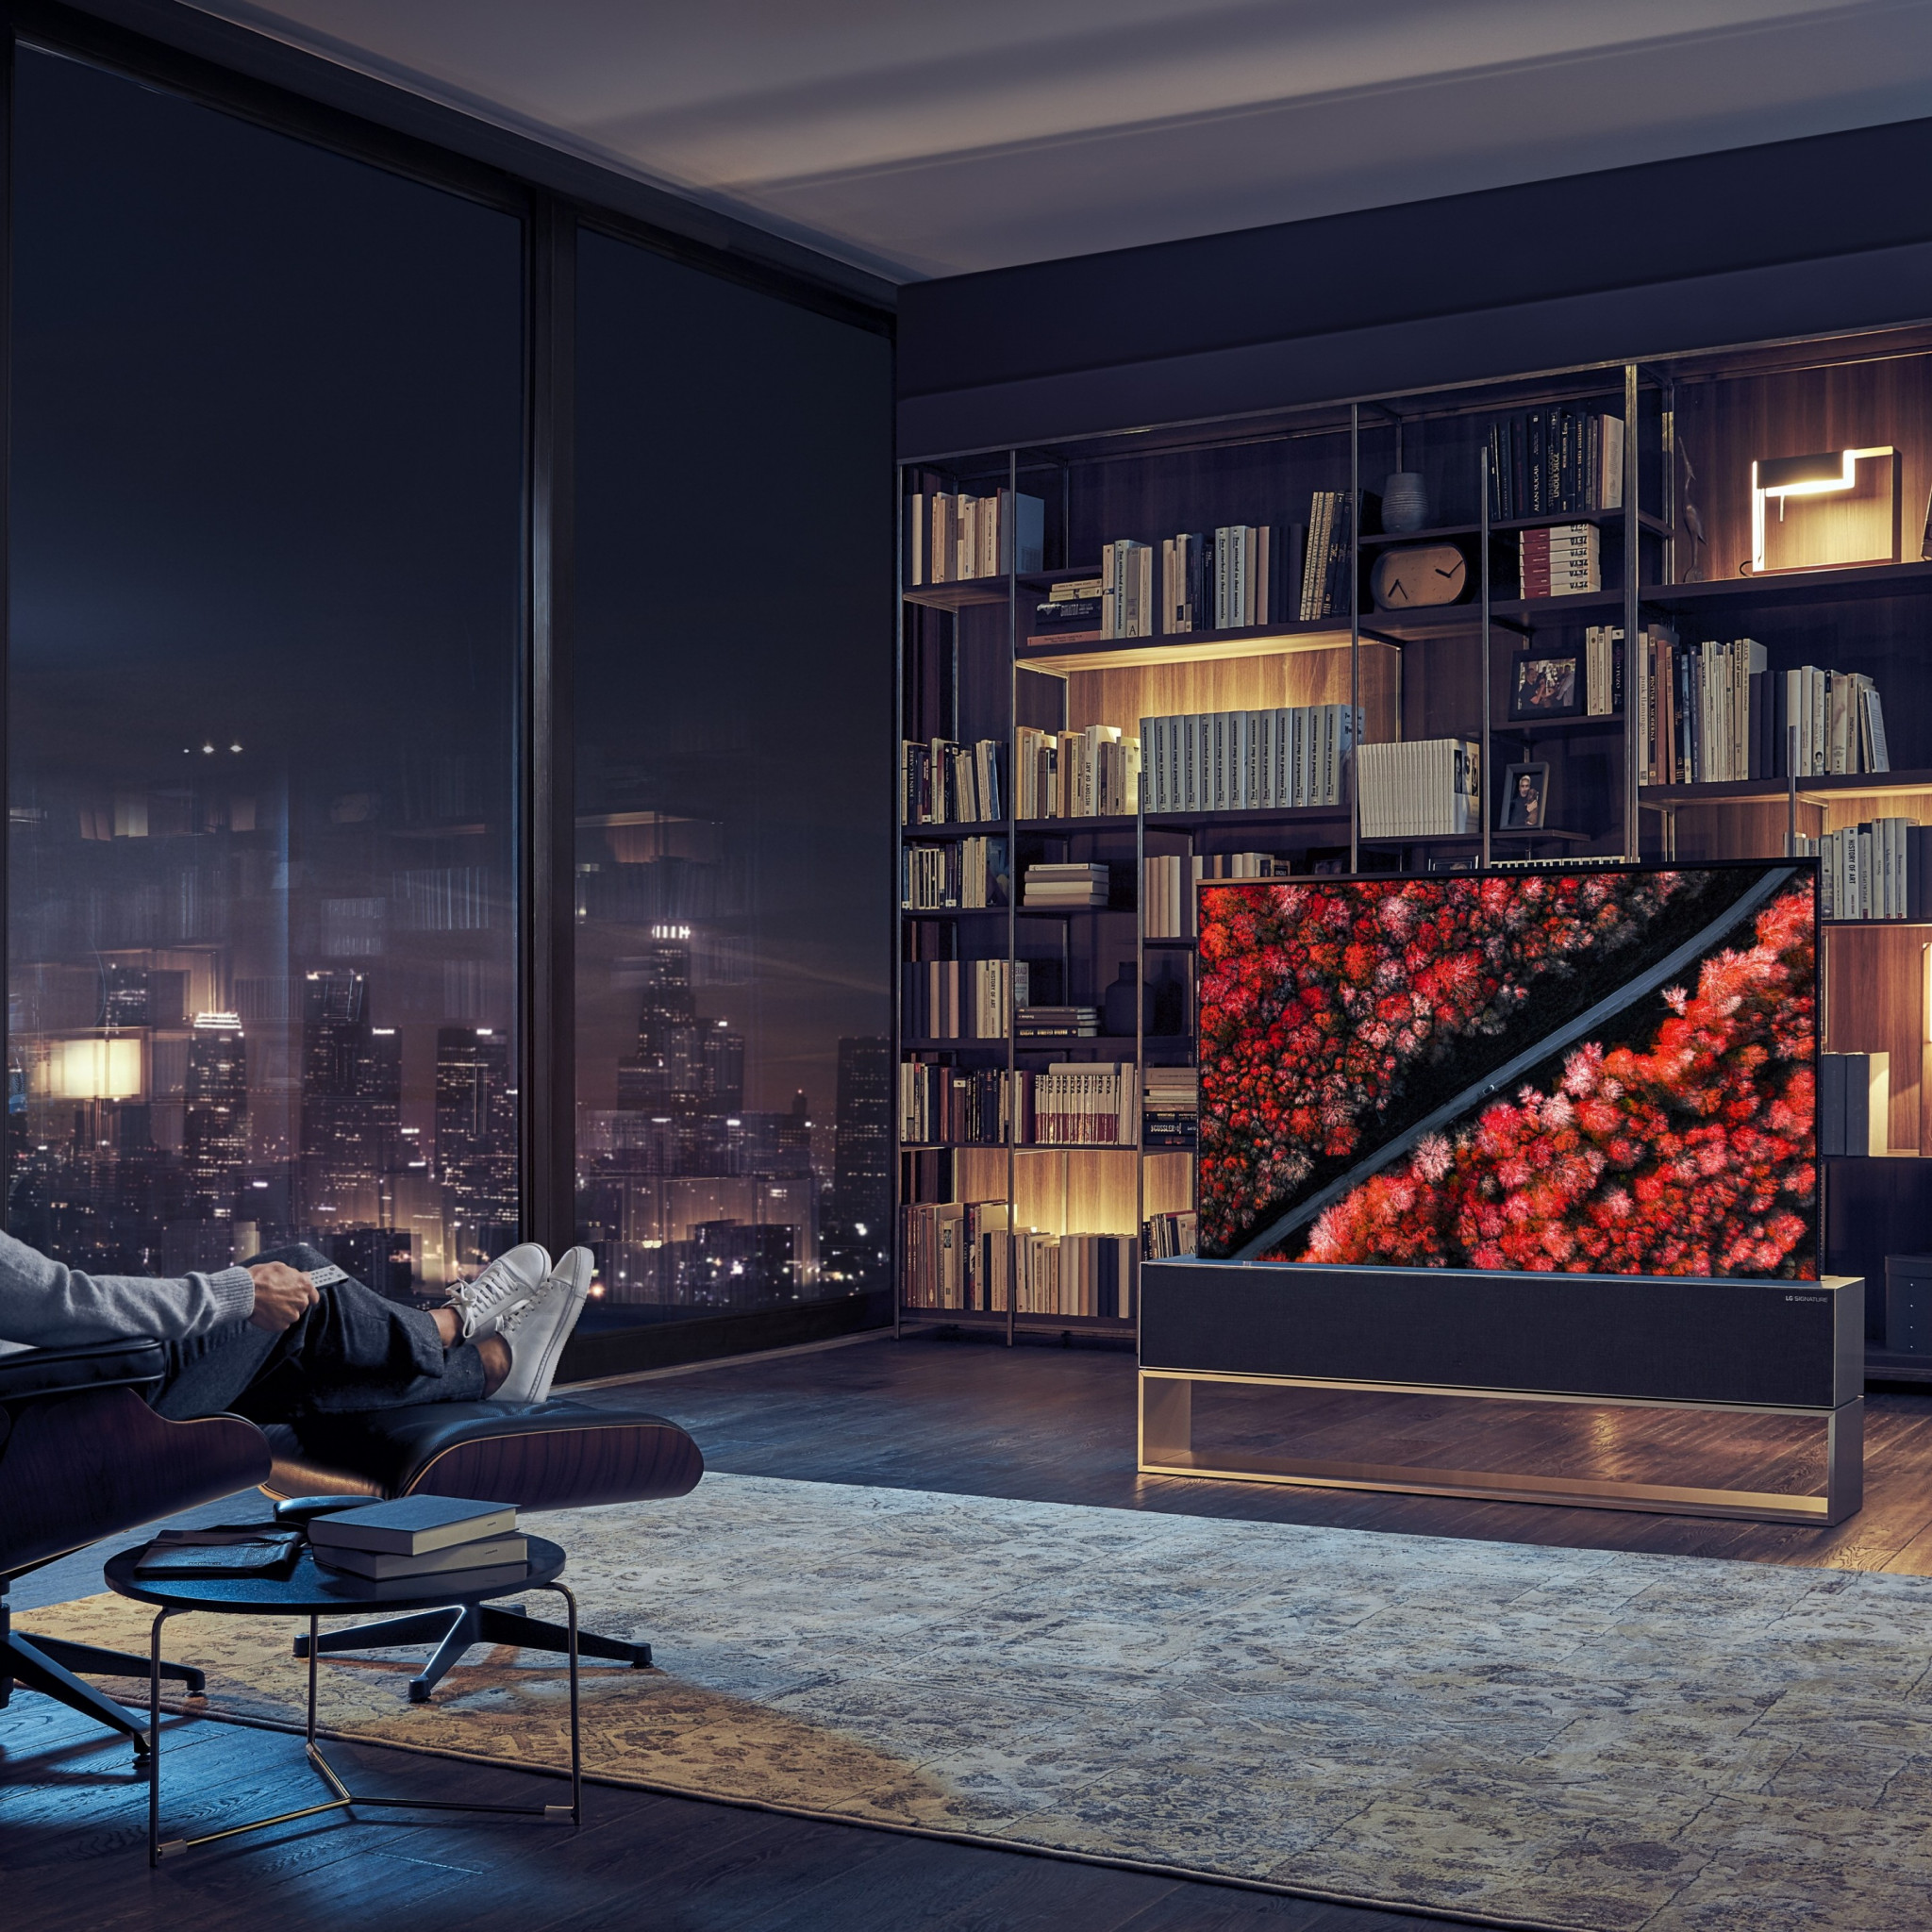 Download wallpaper: LG Signature OLED TV R 2048x2048